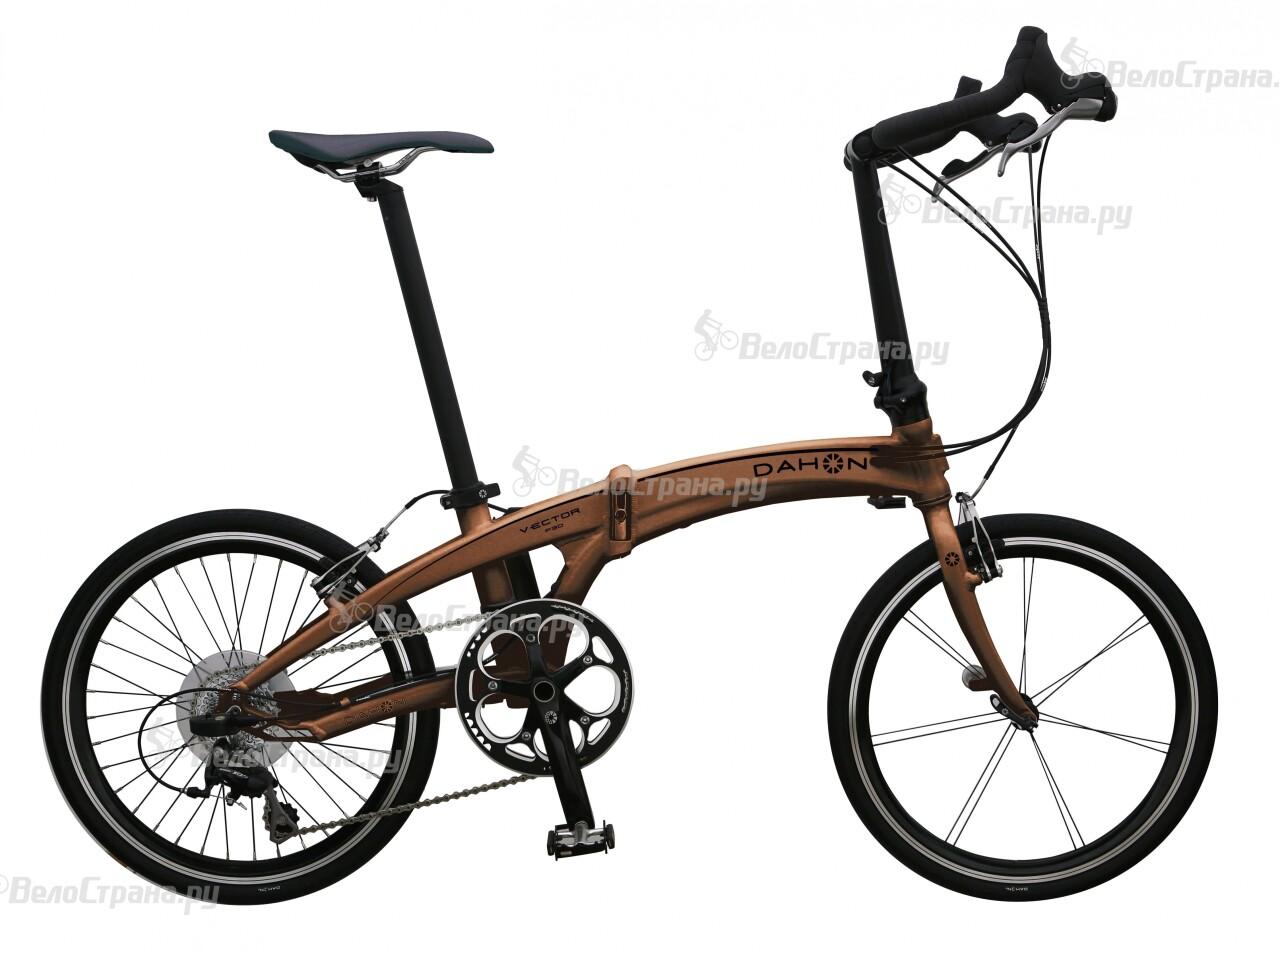 Велосипед Dahon Vector DD30 (2015) велосипед dahon speed d7 2015